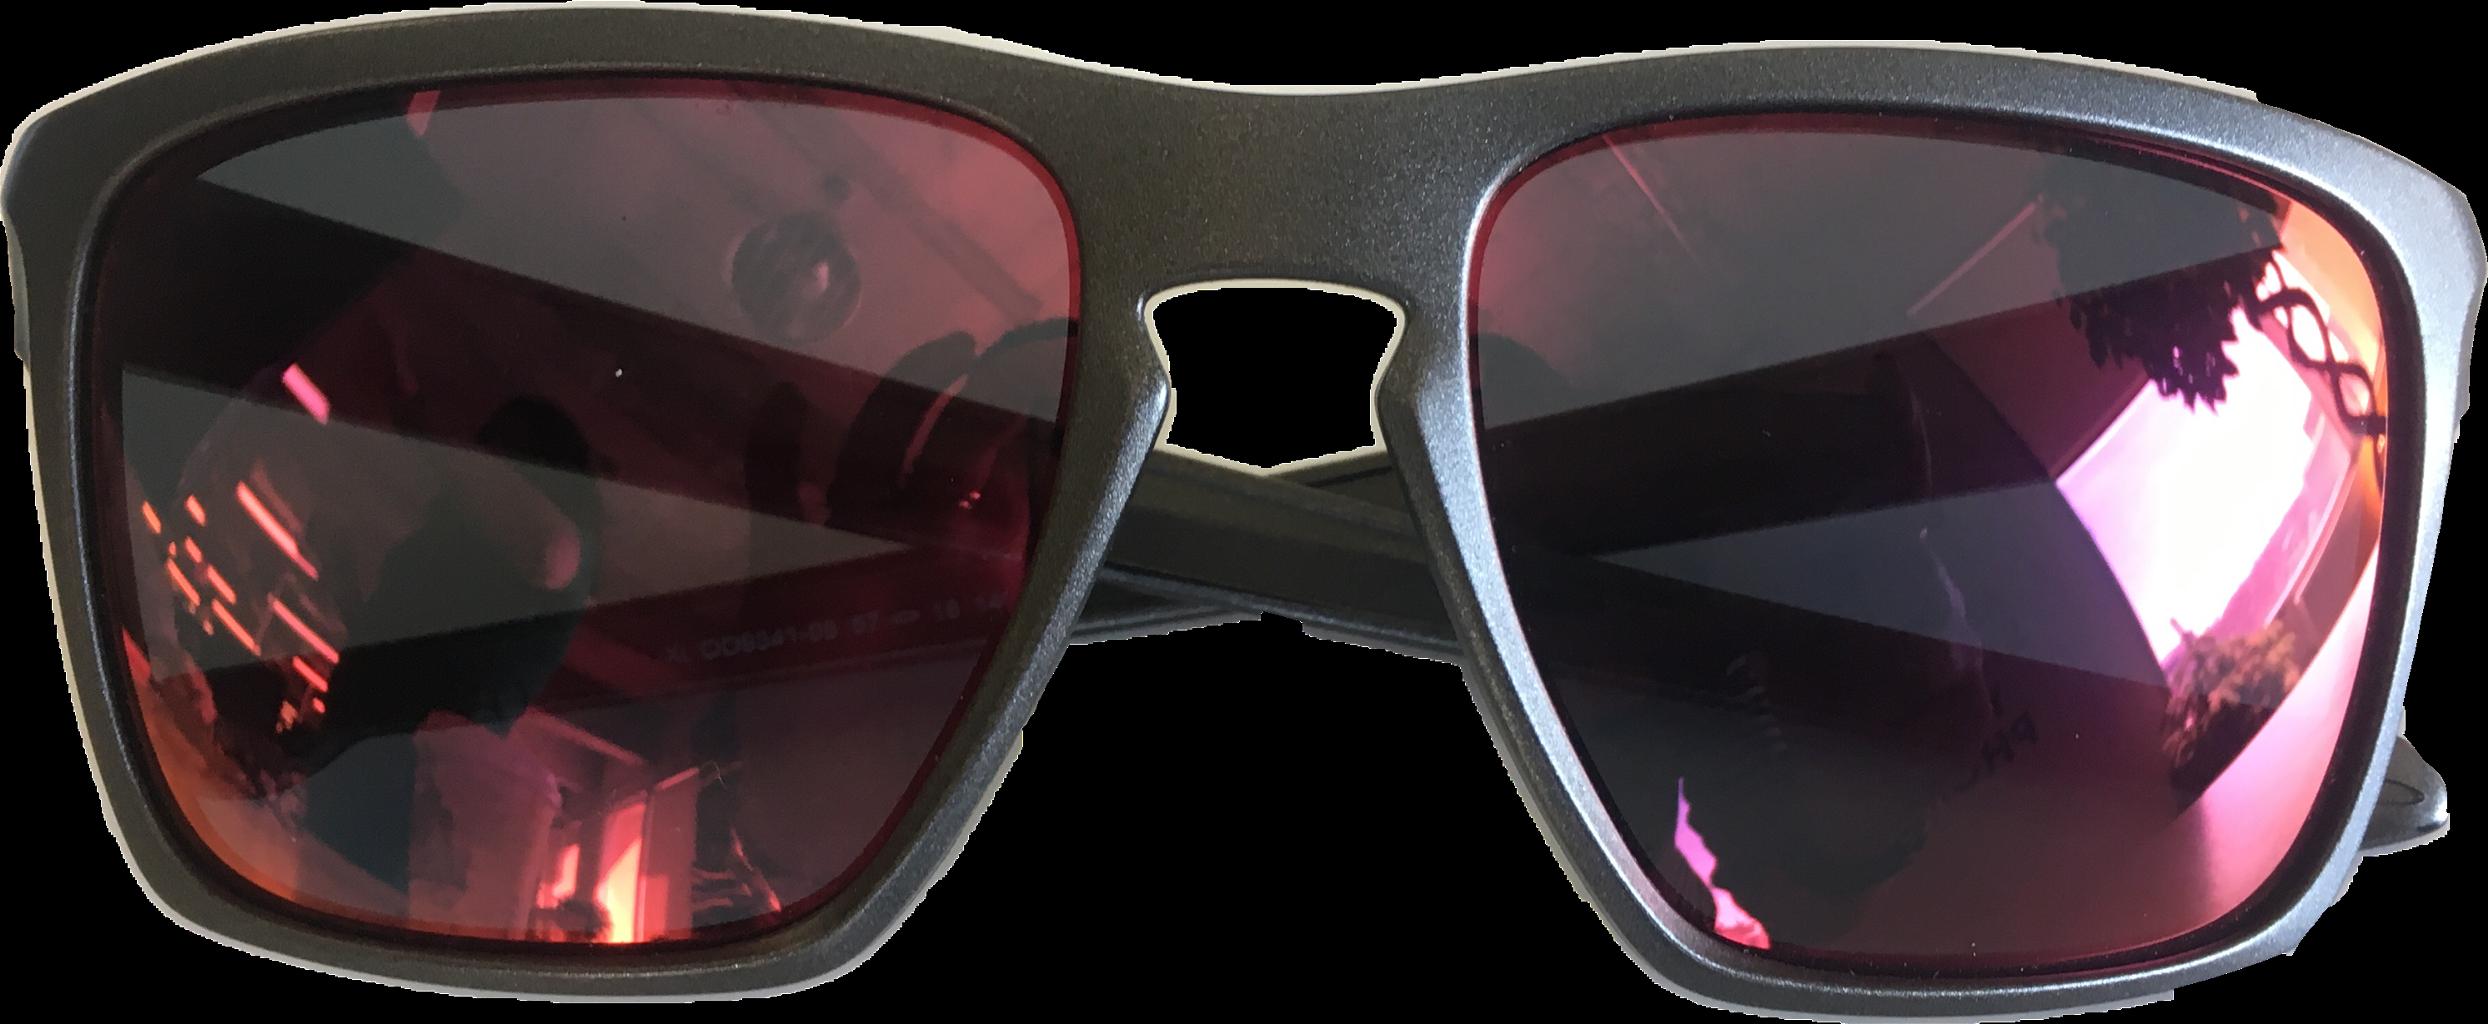 Eyeglasses cool summer sunny. Sunglasses clipart stylish